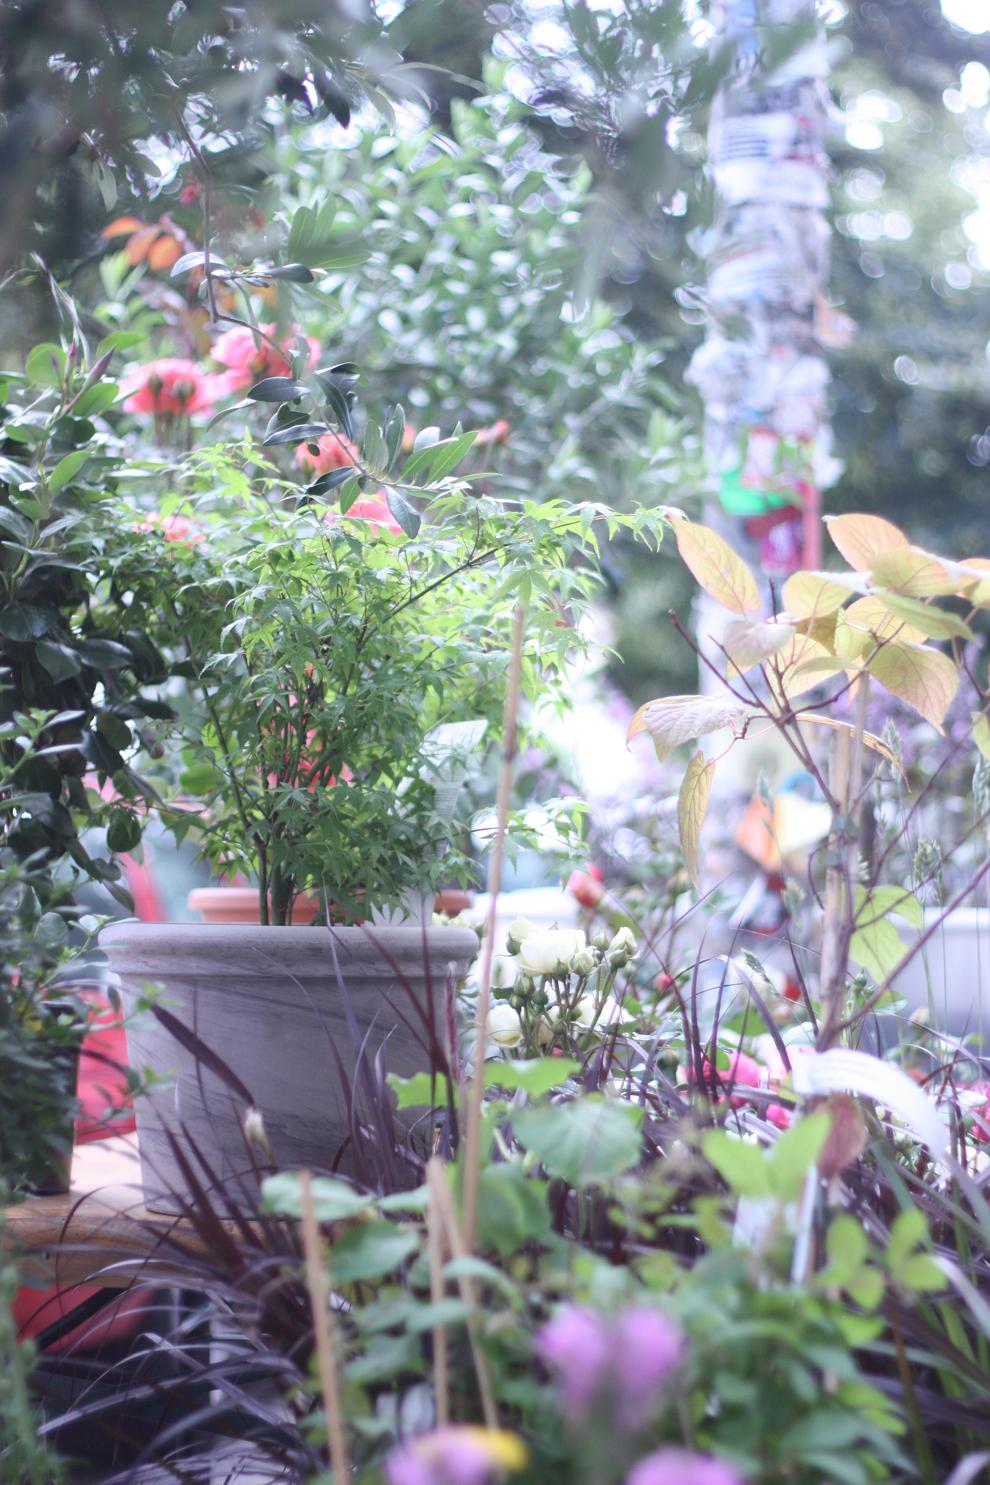 gruene_flora_outside